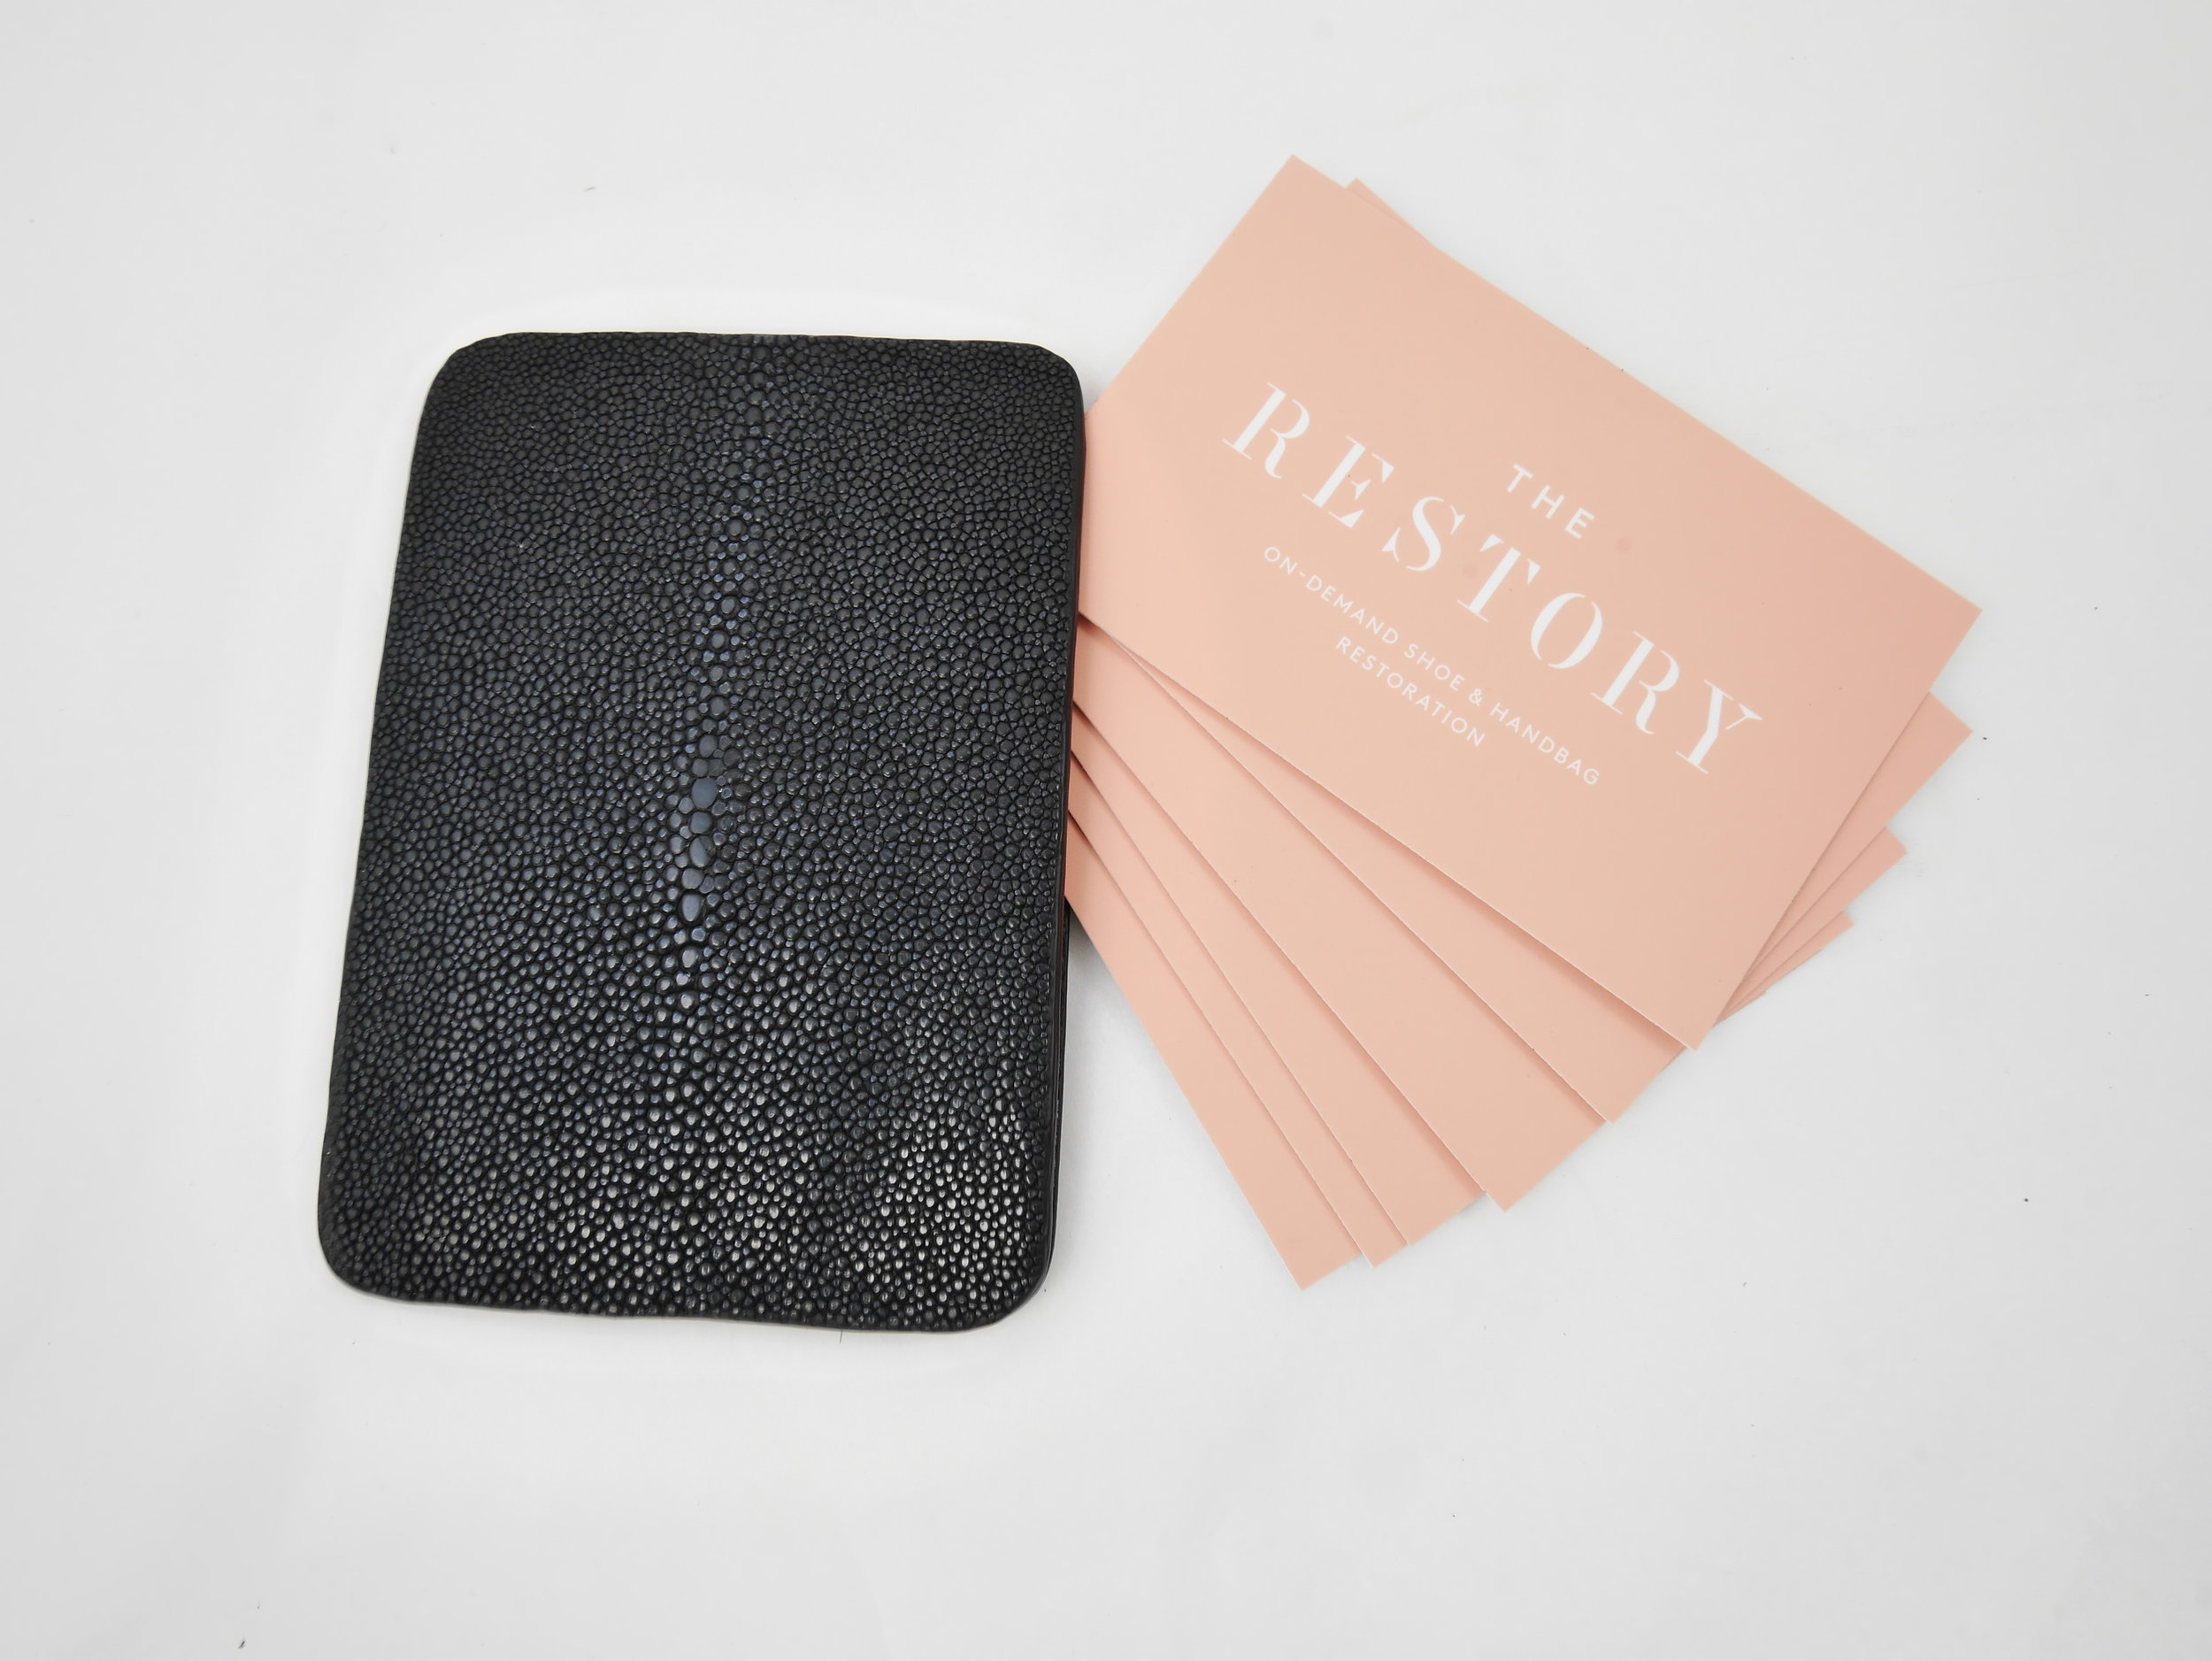 Stingray Card Case